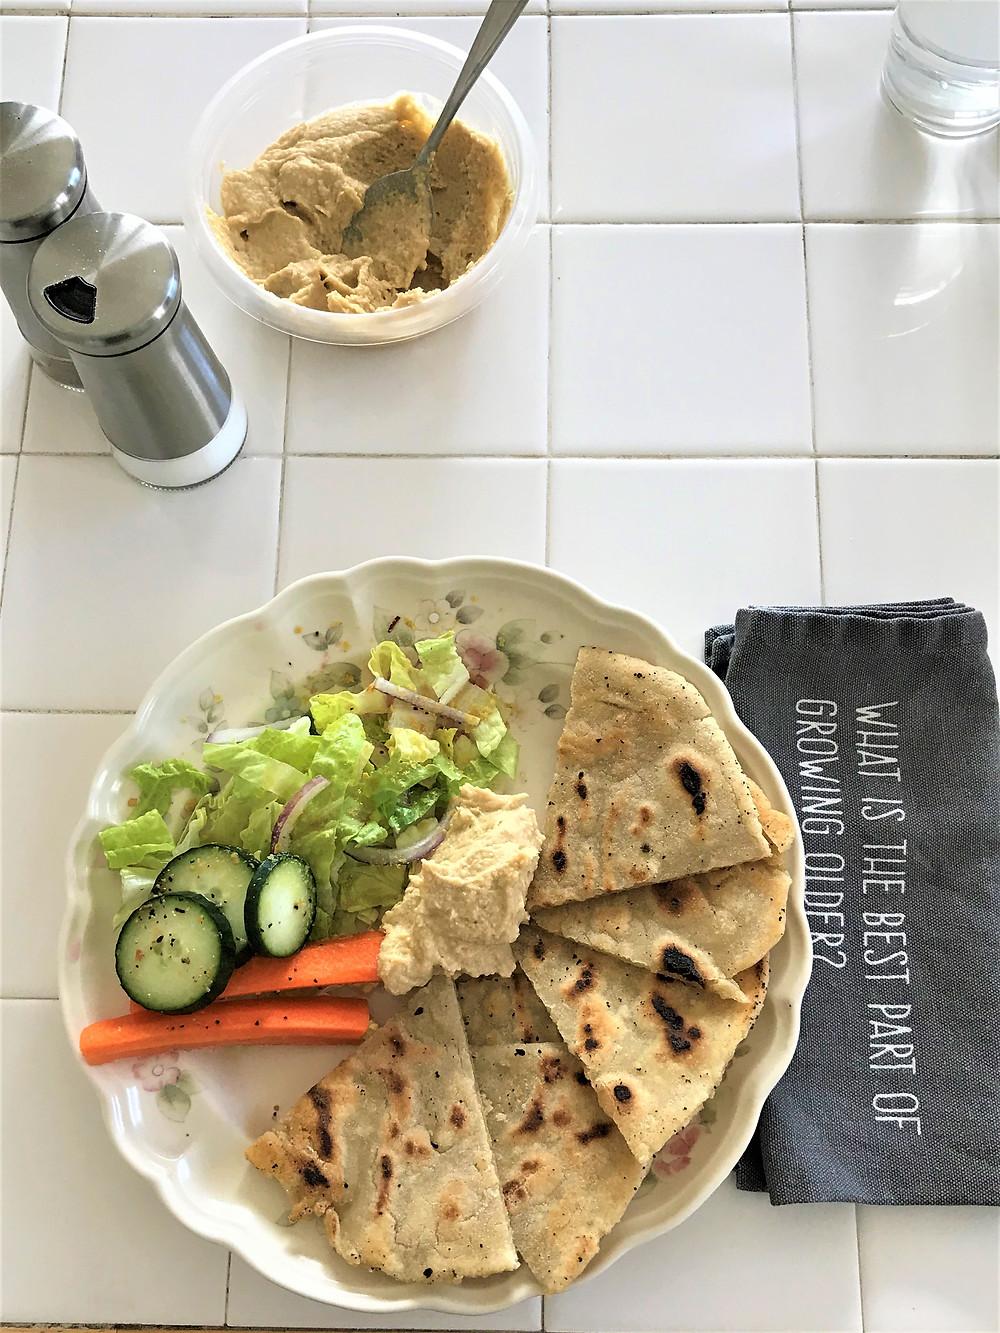 salad, hummus, carrots, and cucumbers